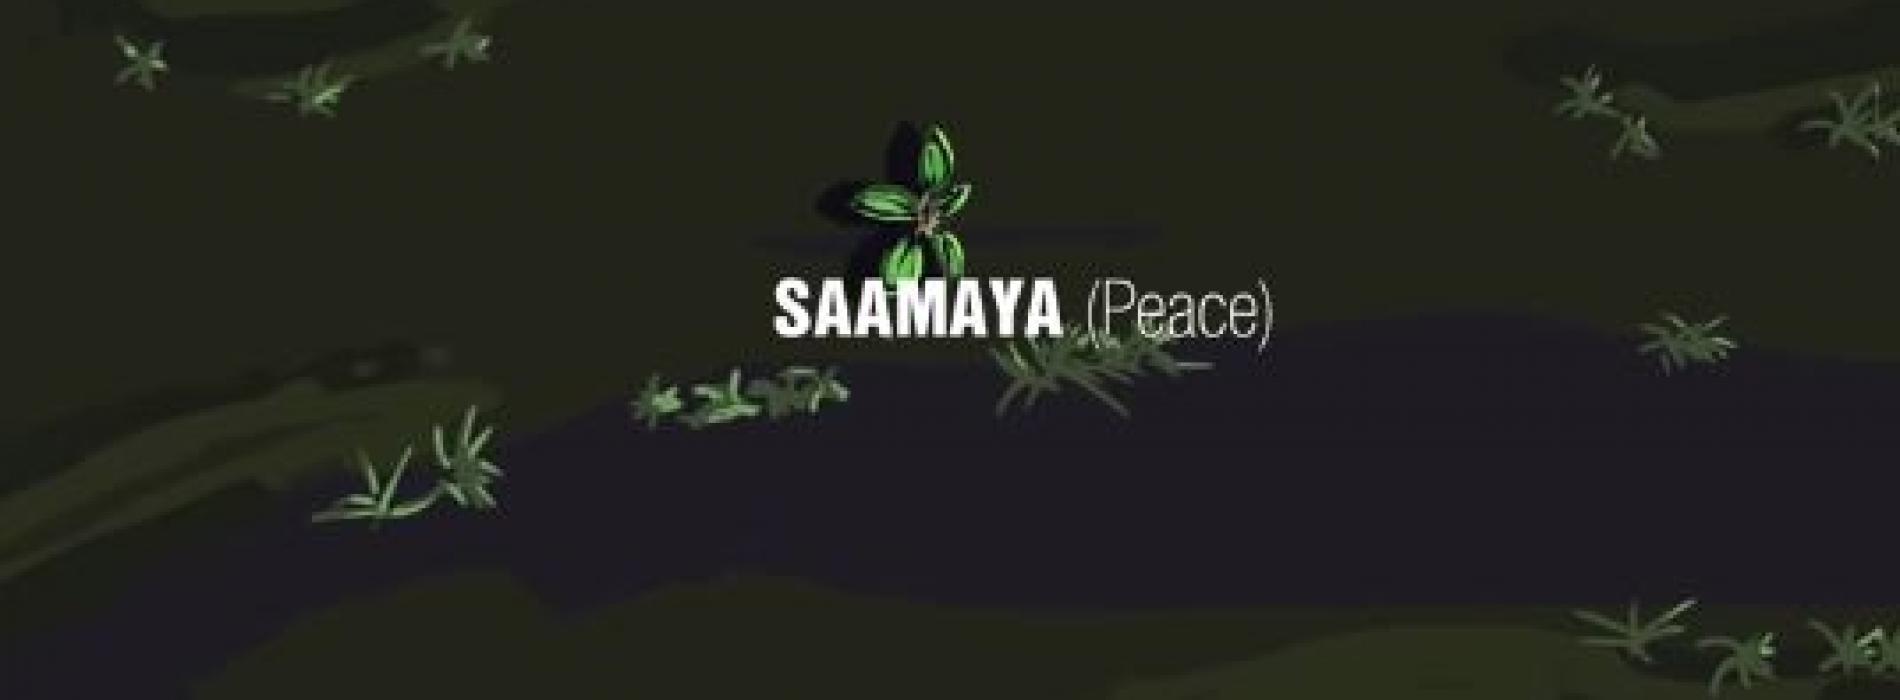 New Music : Saamaya (සාමය) – Ranji Wickremasinghe (Official Music Video)